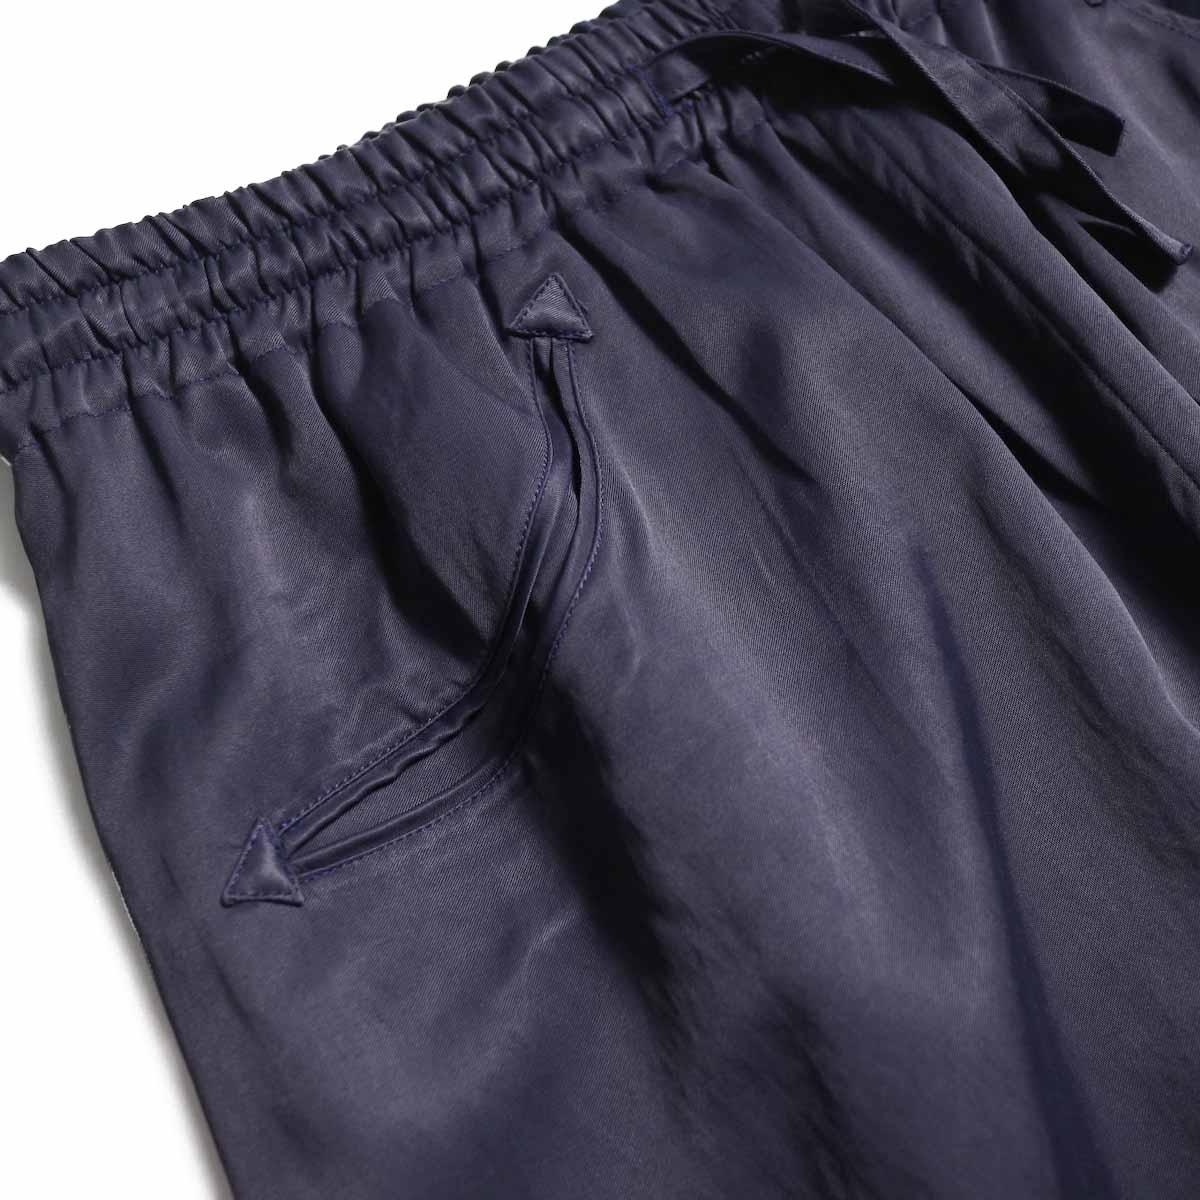 Needles / Fringe Cowboy Pant -R/C Twill Sateen (Purple) ポケット